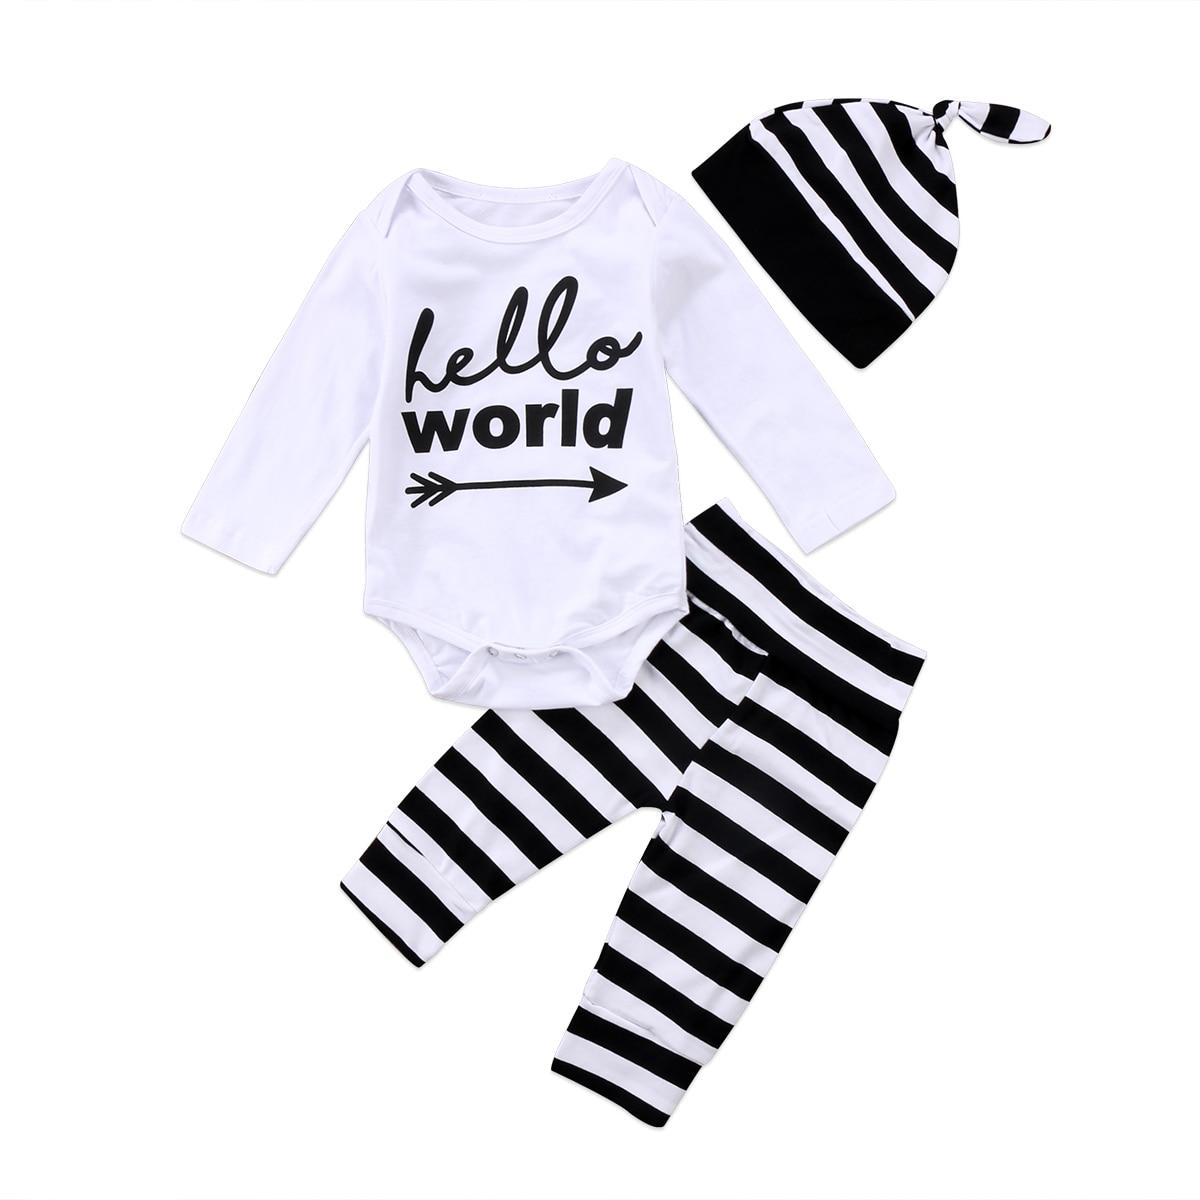 Hello World Cute Newborn Baby Boy Girl Clothes Letter White Romper Jumpsuit+ Long Striped Pants Trousers+ Hat Outfit Set 3Pcs